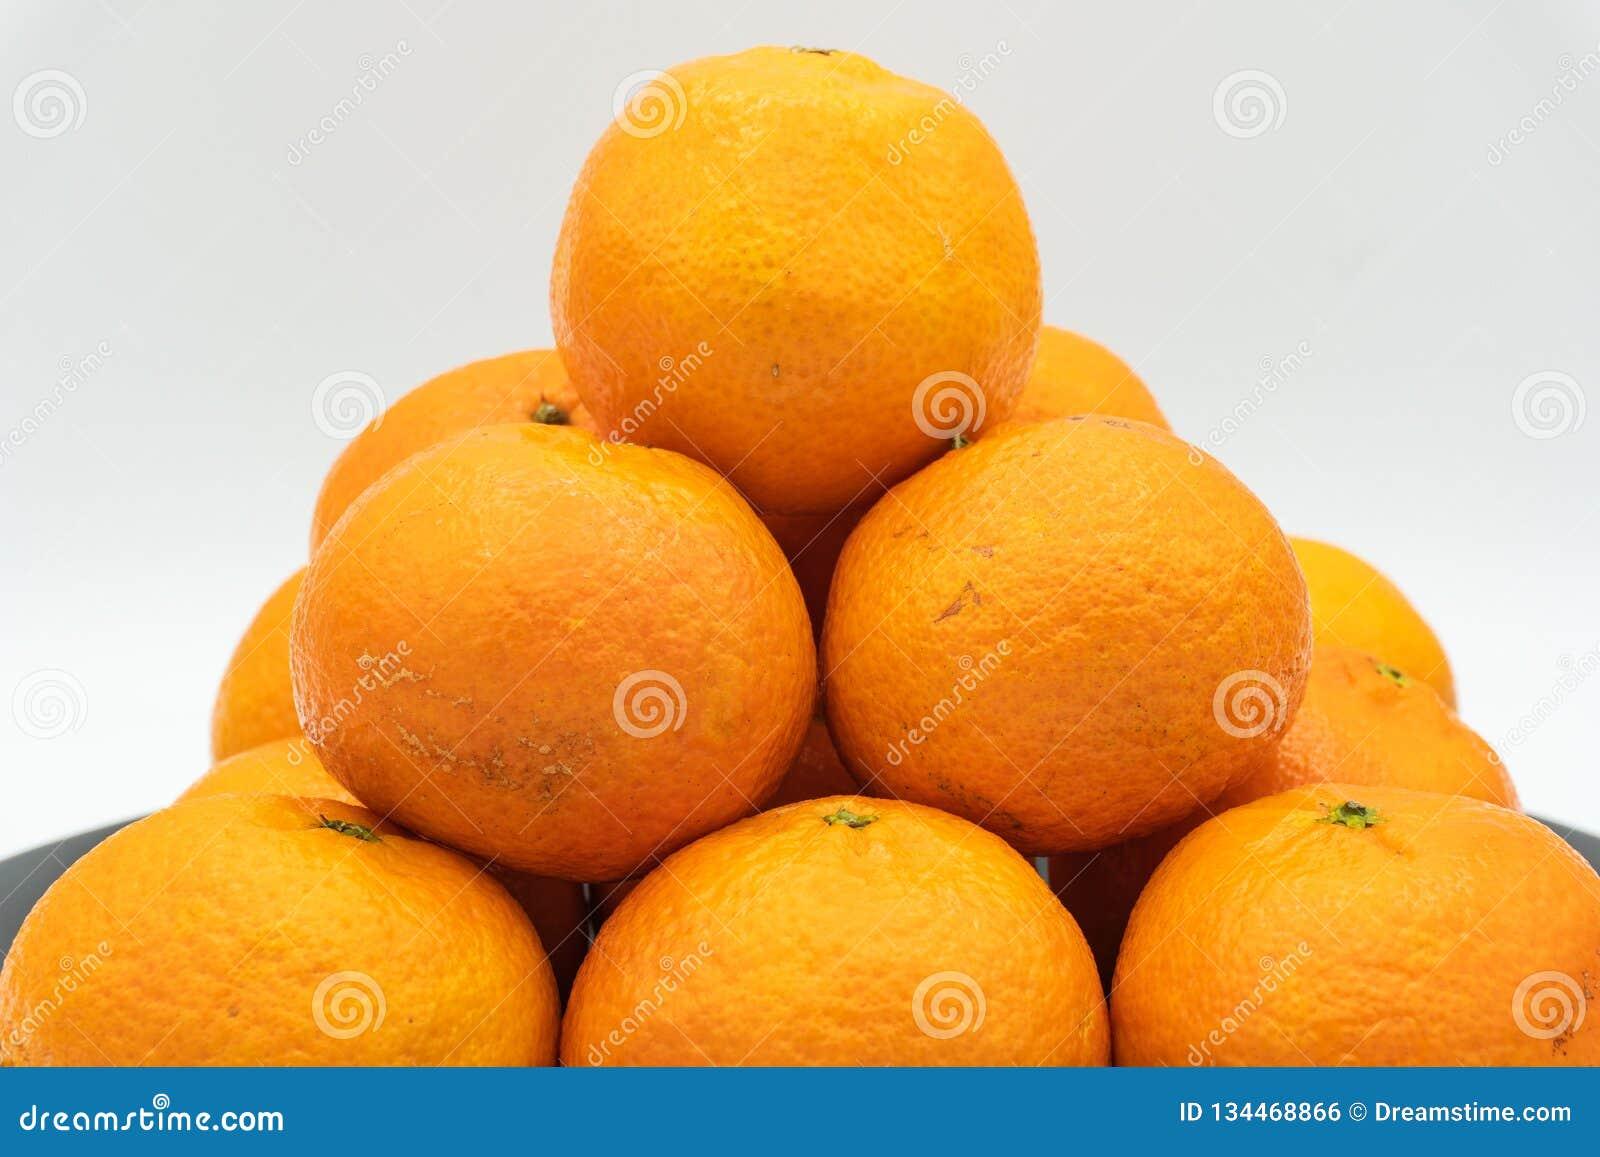 Tangerines from Spain